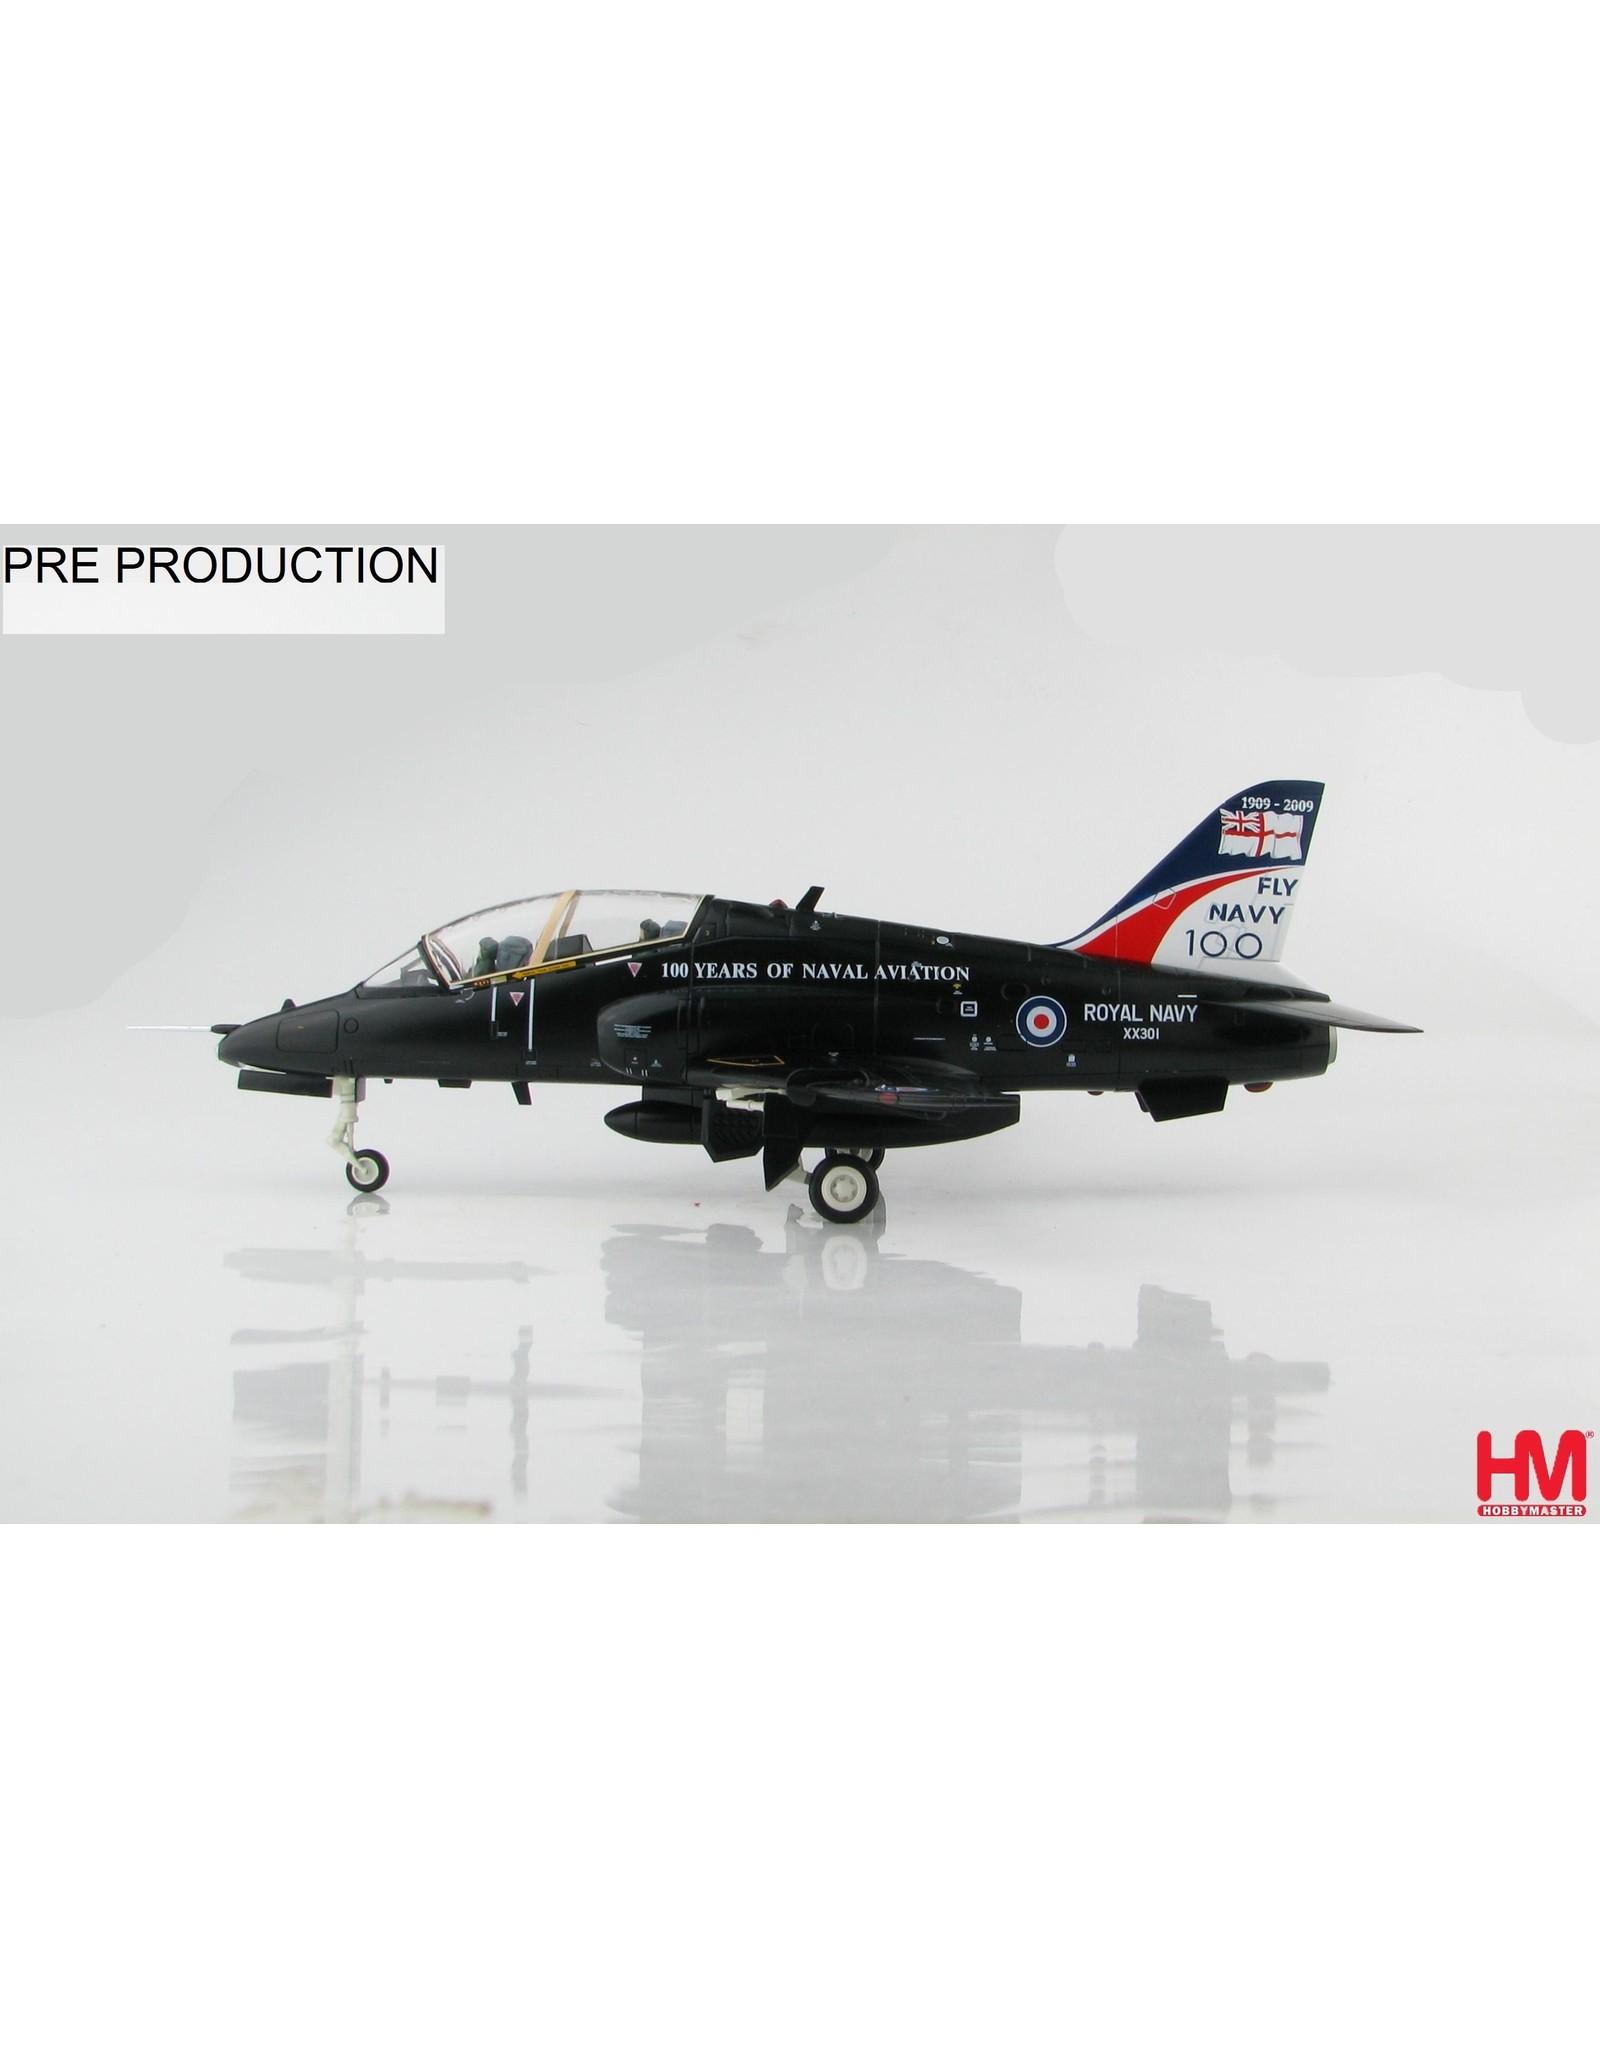 HM Hawk T.Mk.1 Yeovilton 2009